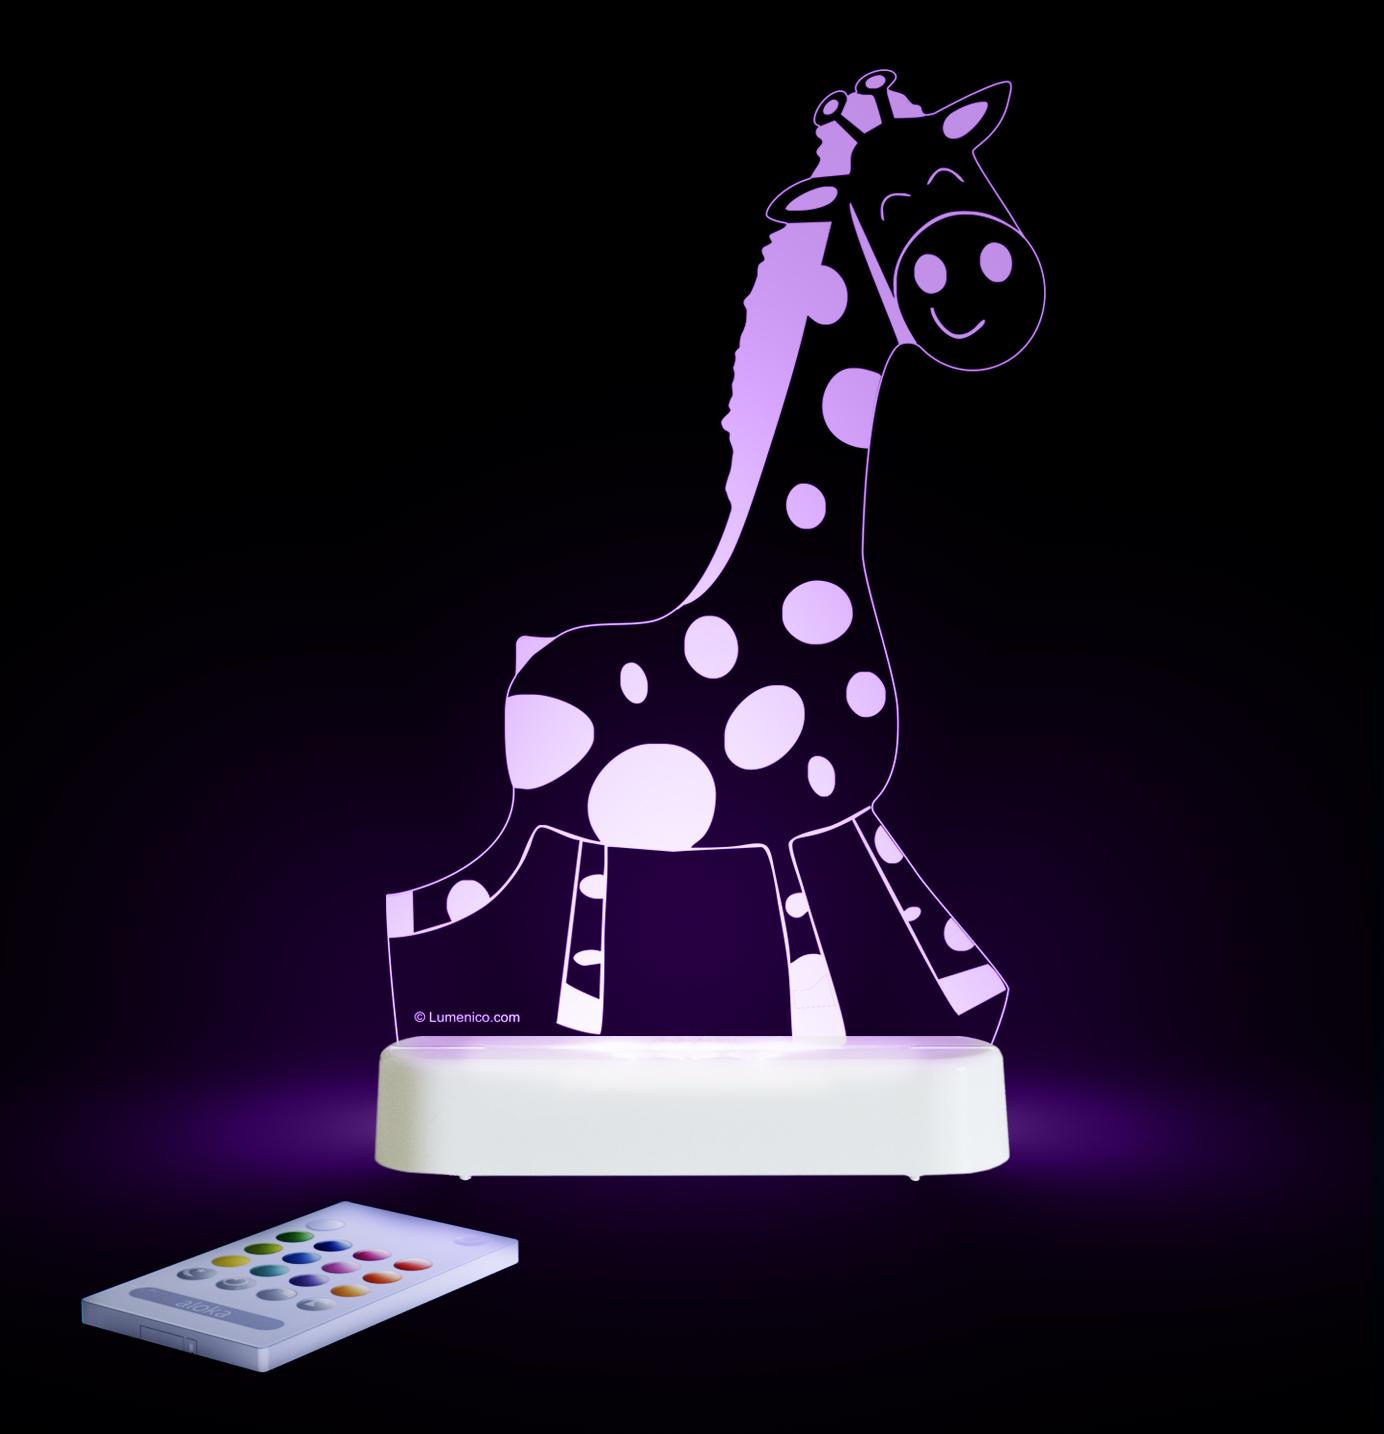 Aloka: Night Light - Giraffe image